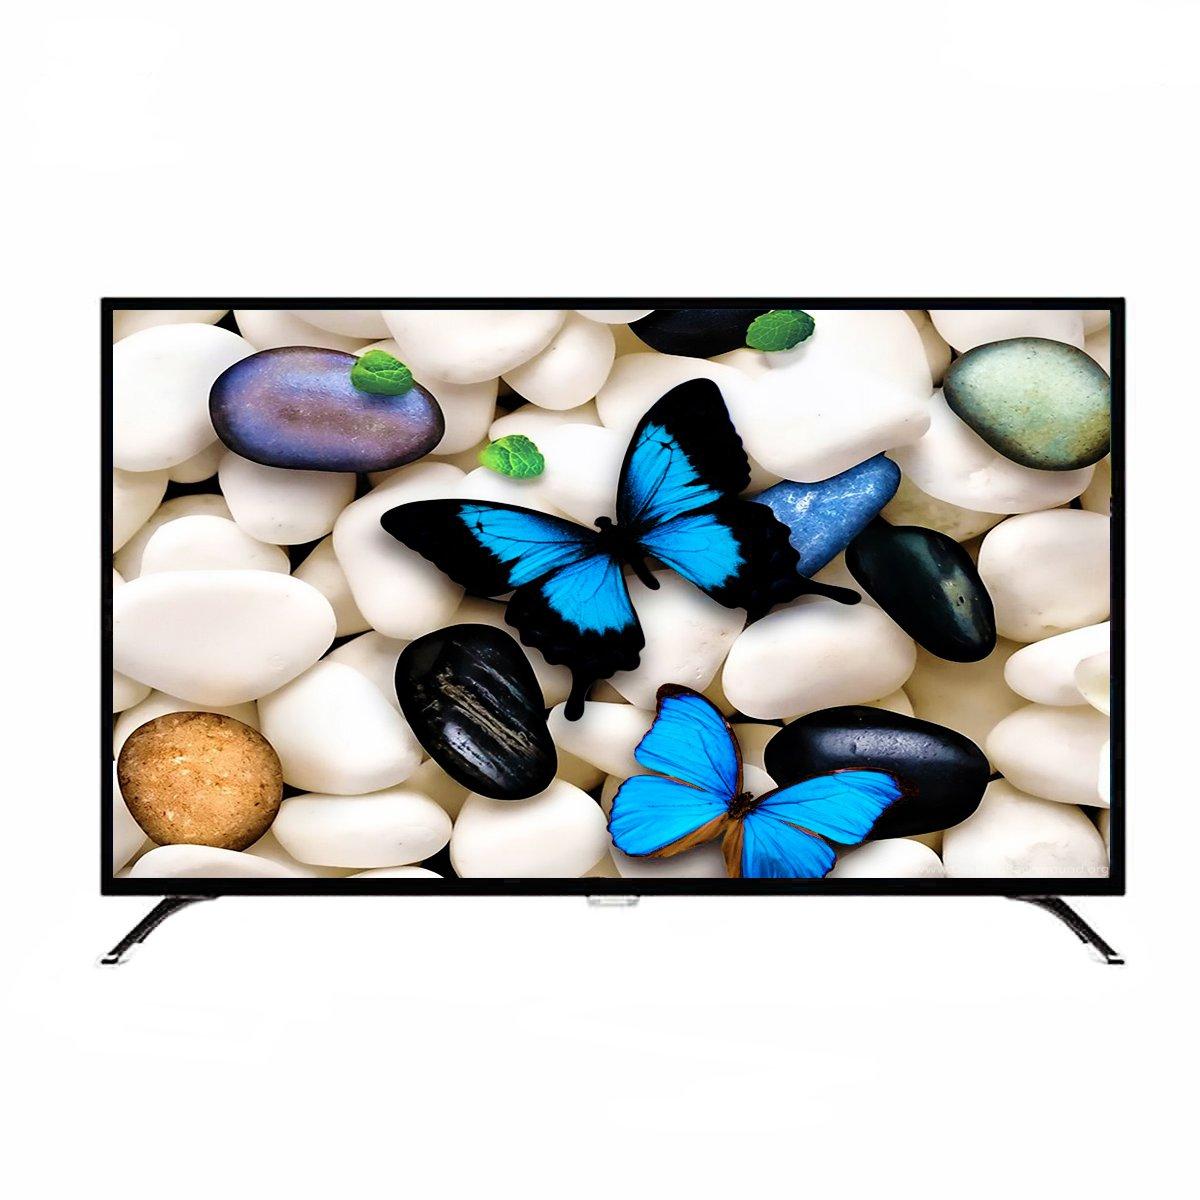 تلویزیون ال ای دی هوشمند فیلیپس مدل 50put6002. سایز 50 اینچ